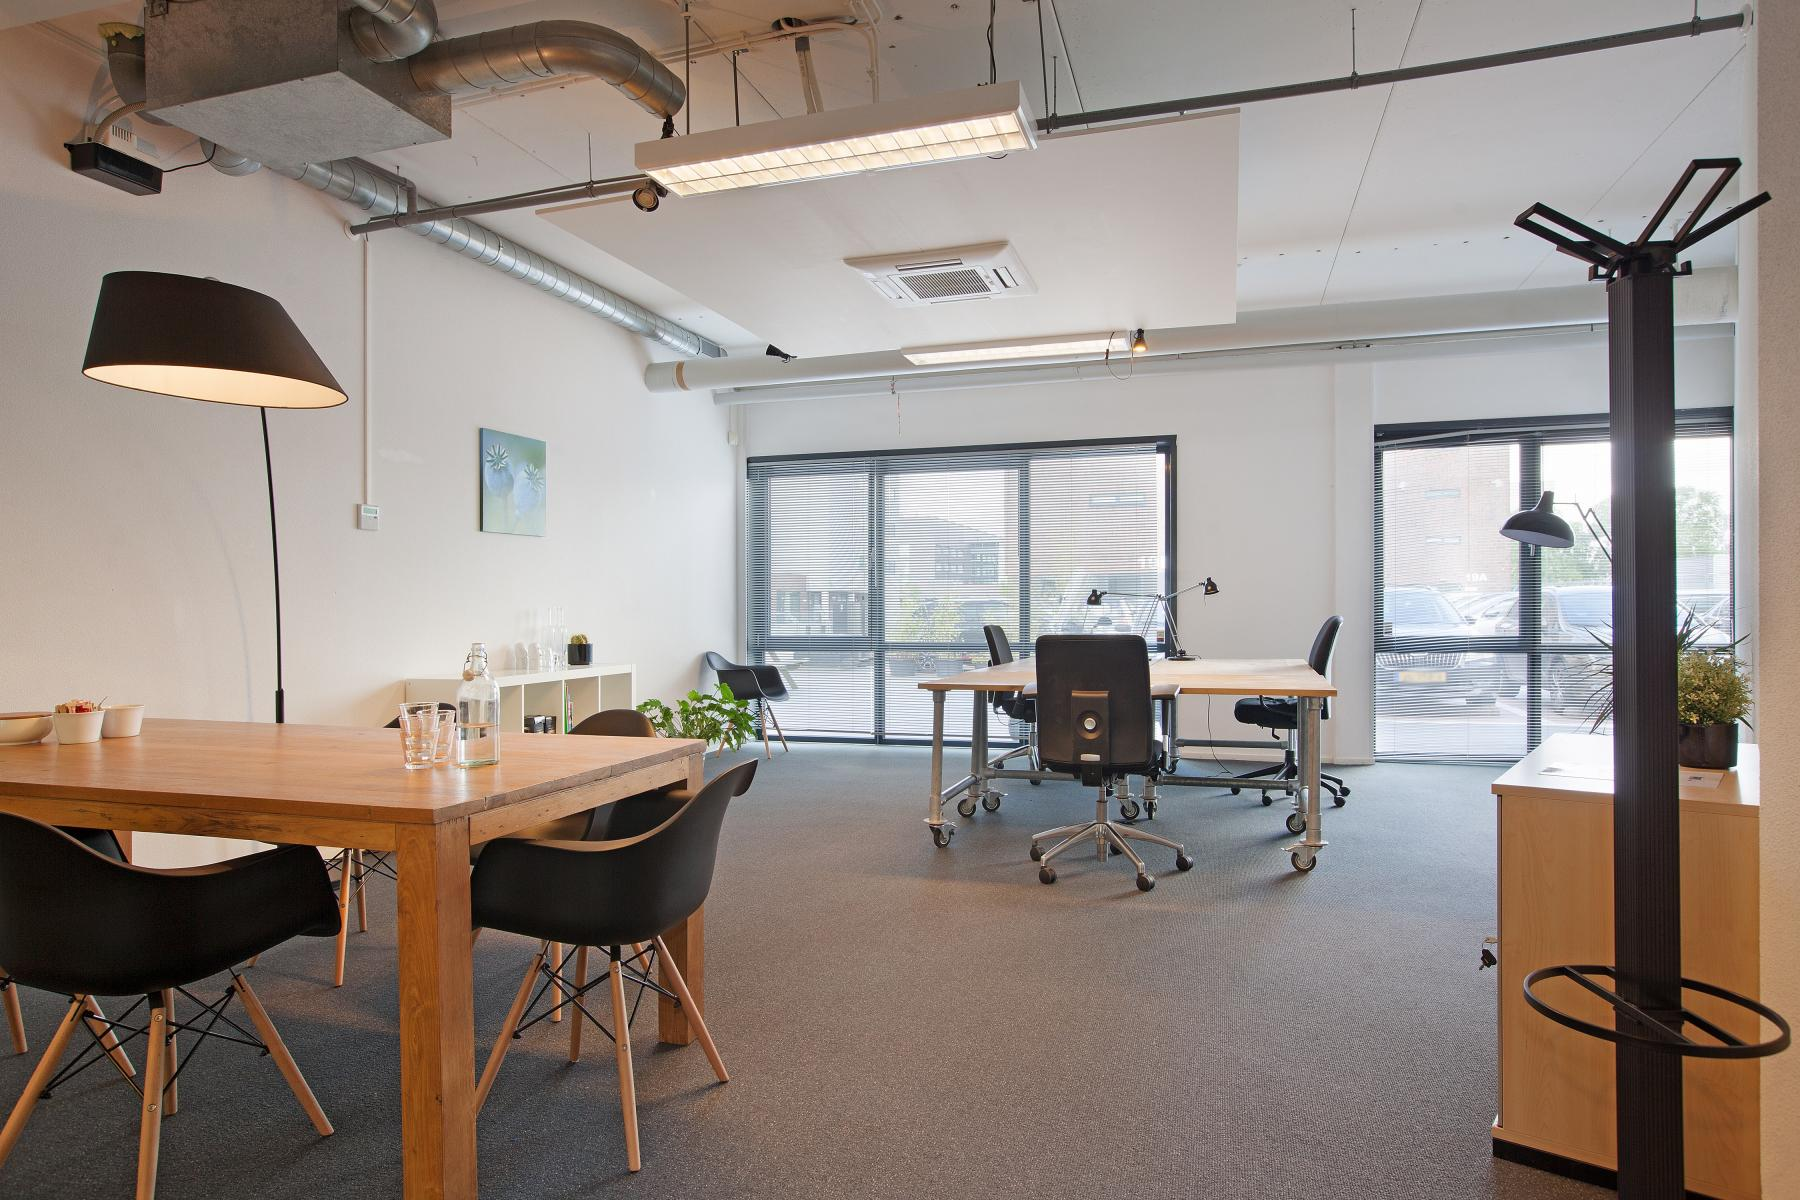 kantoorruimte meubilair te huur amsterdam asterweg